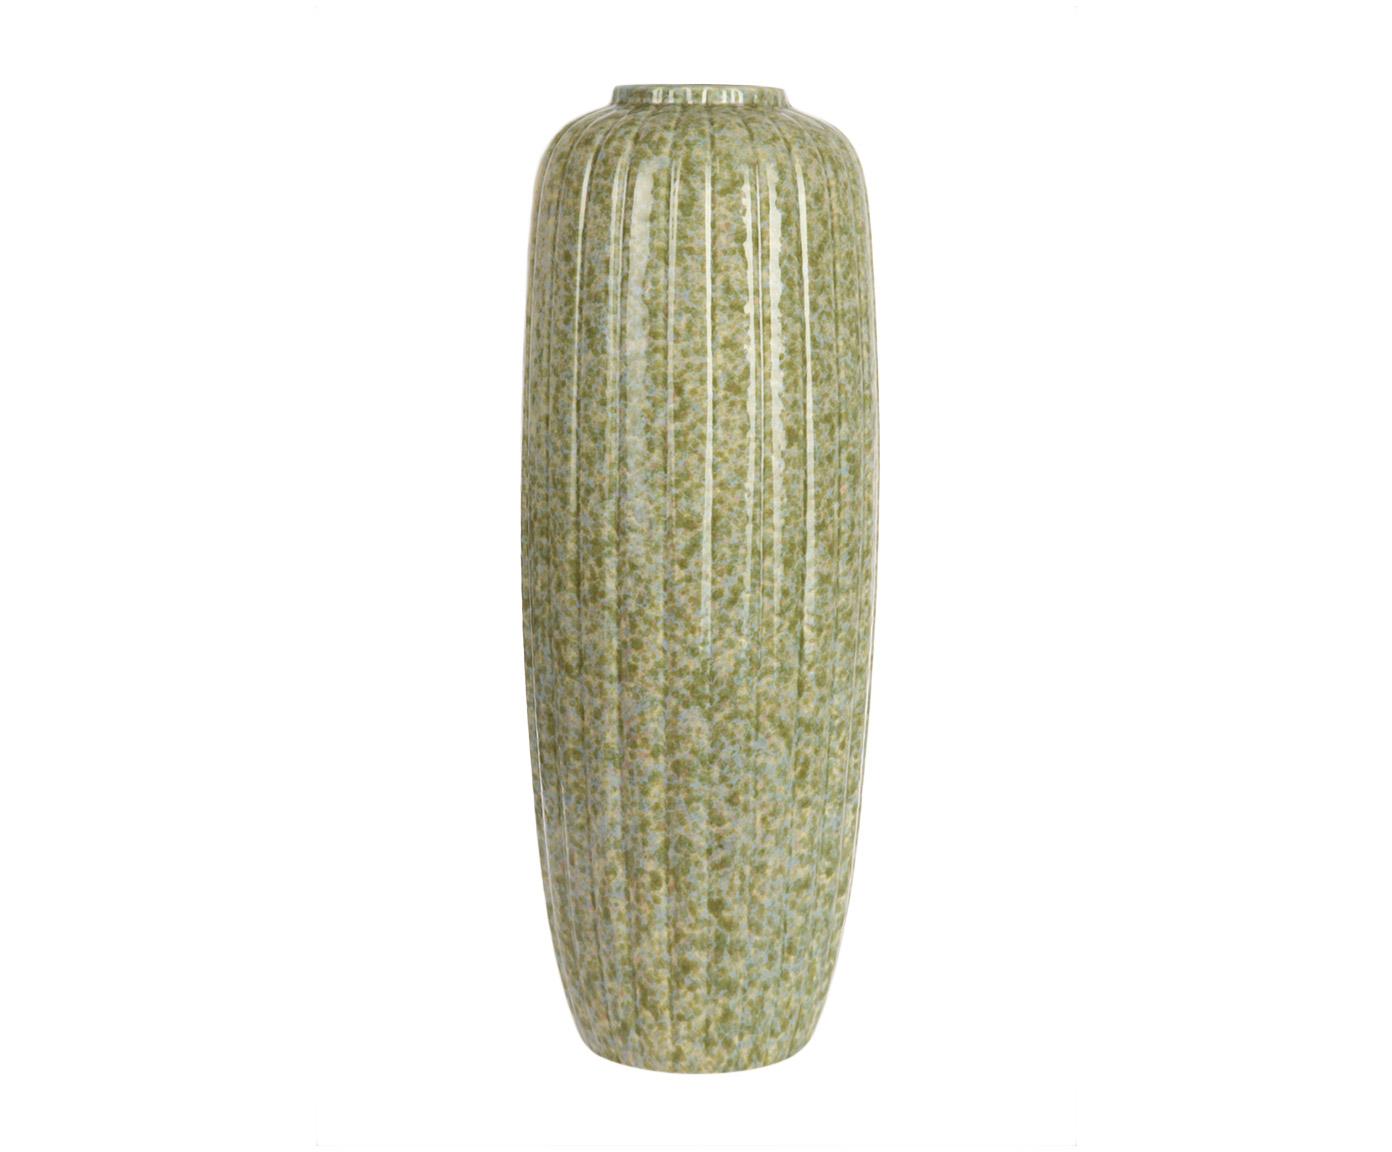 Декоративная ваза Farol 15430064 от thefurnish